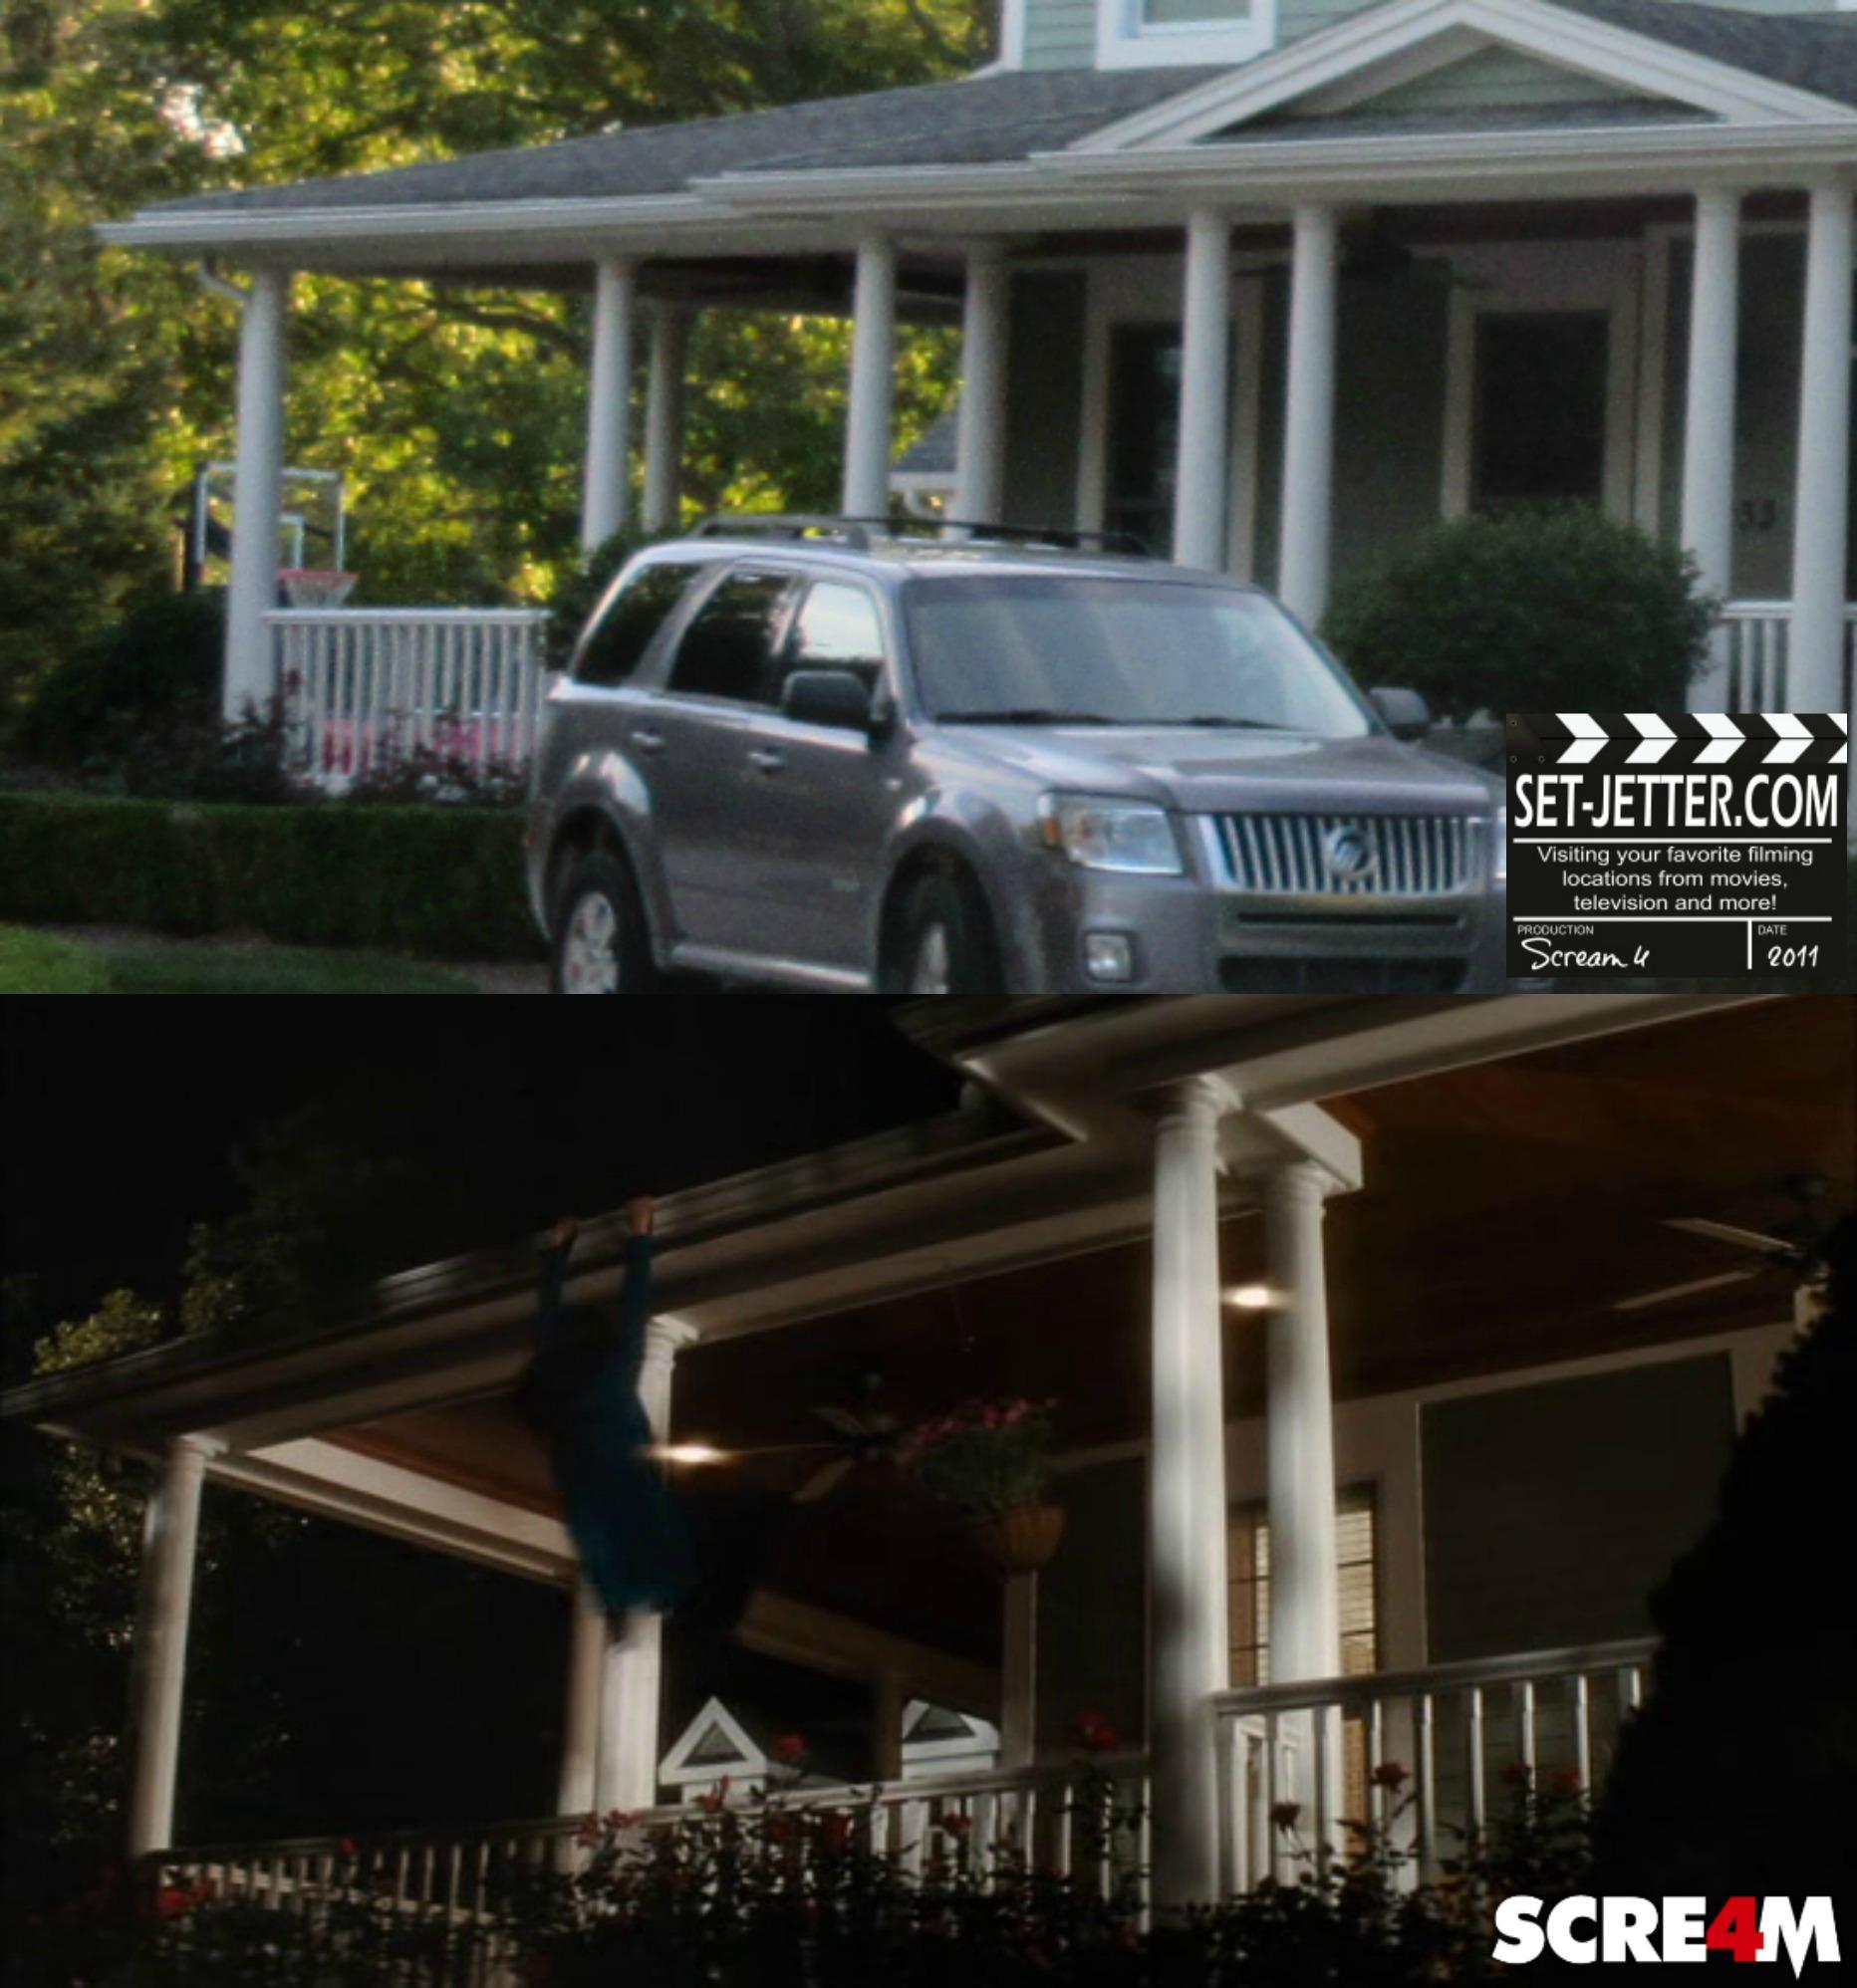 Scream4 comparison 148.jpg